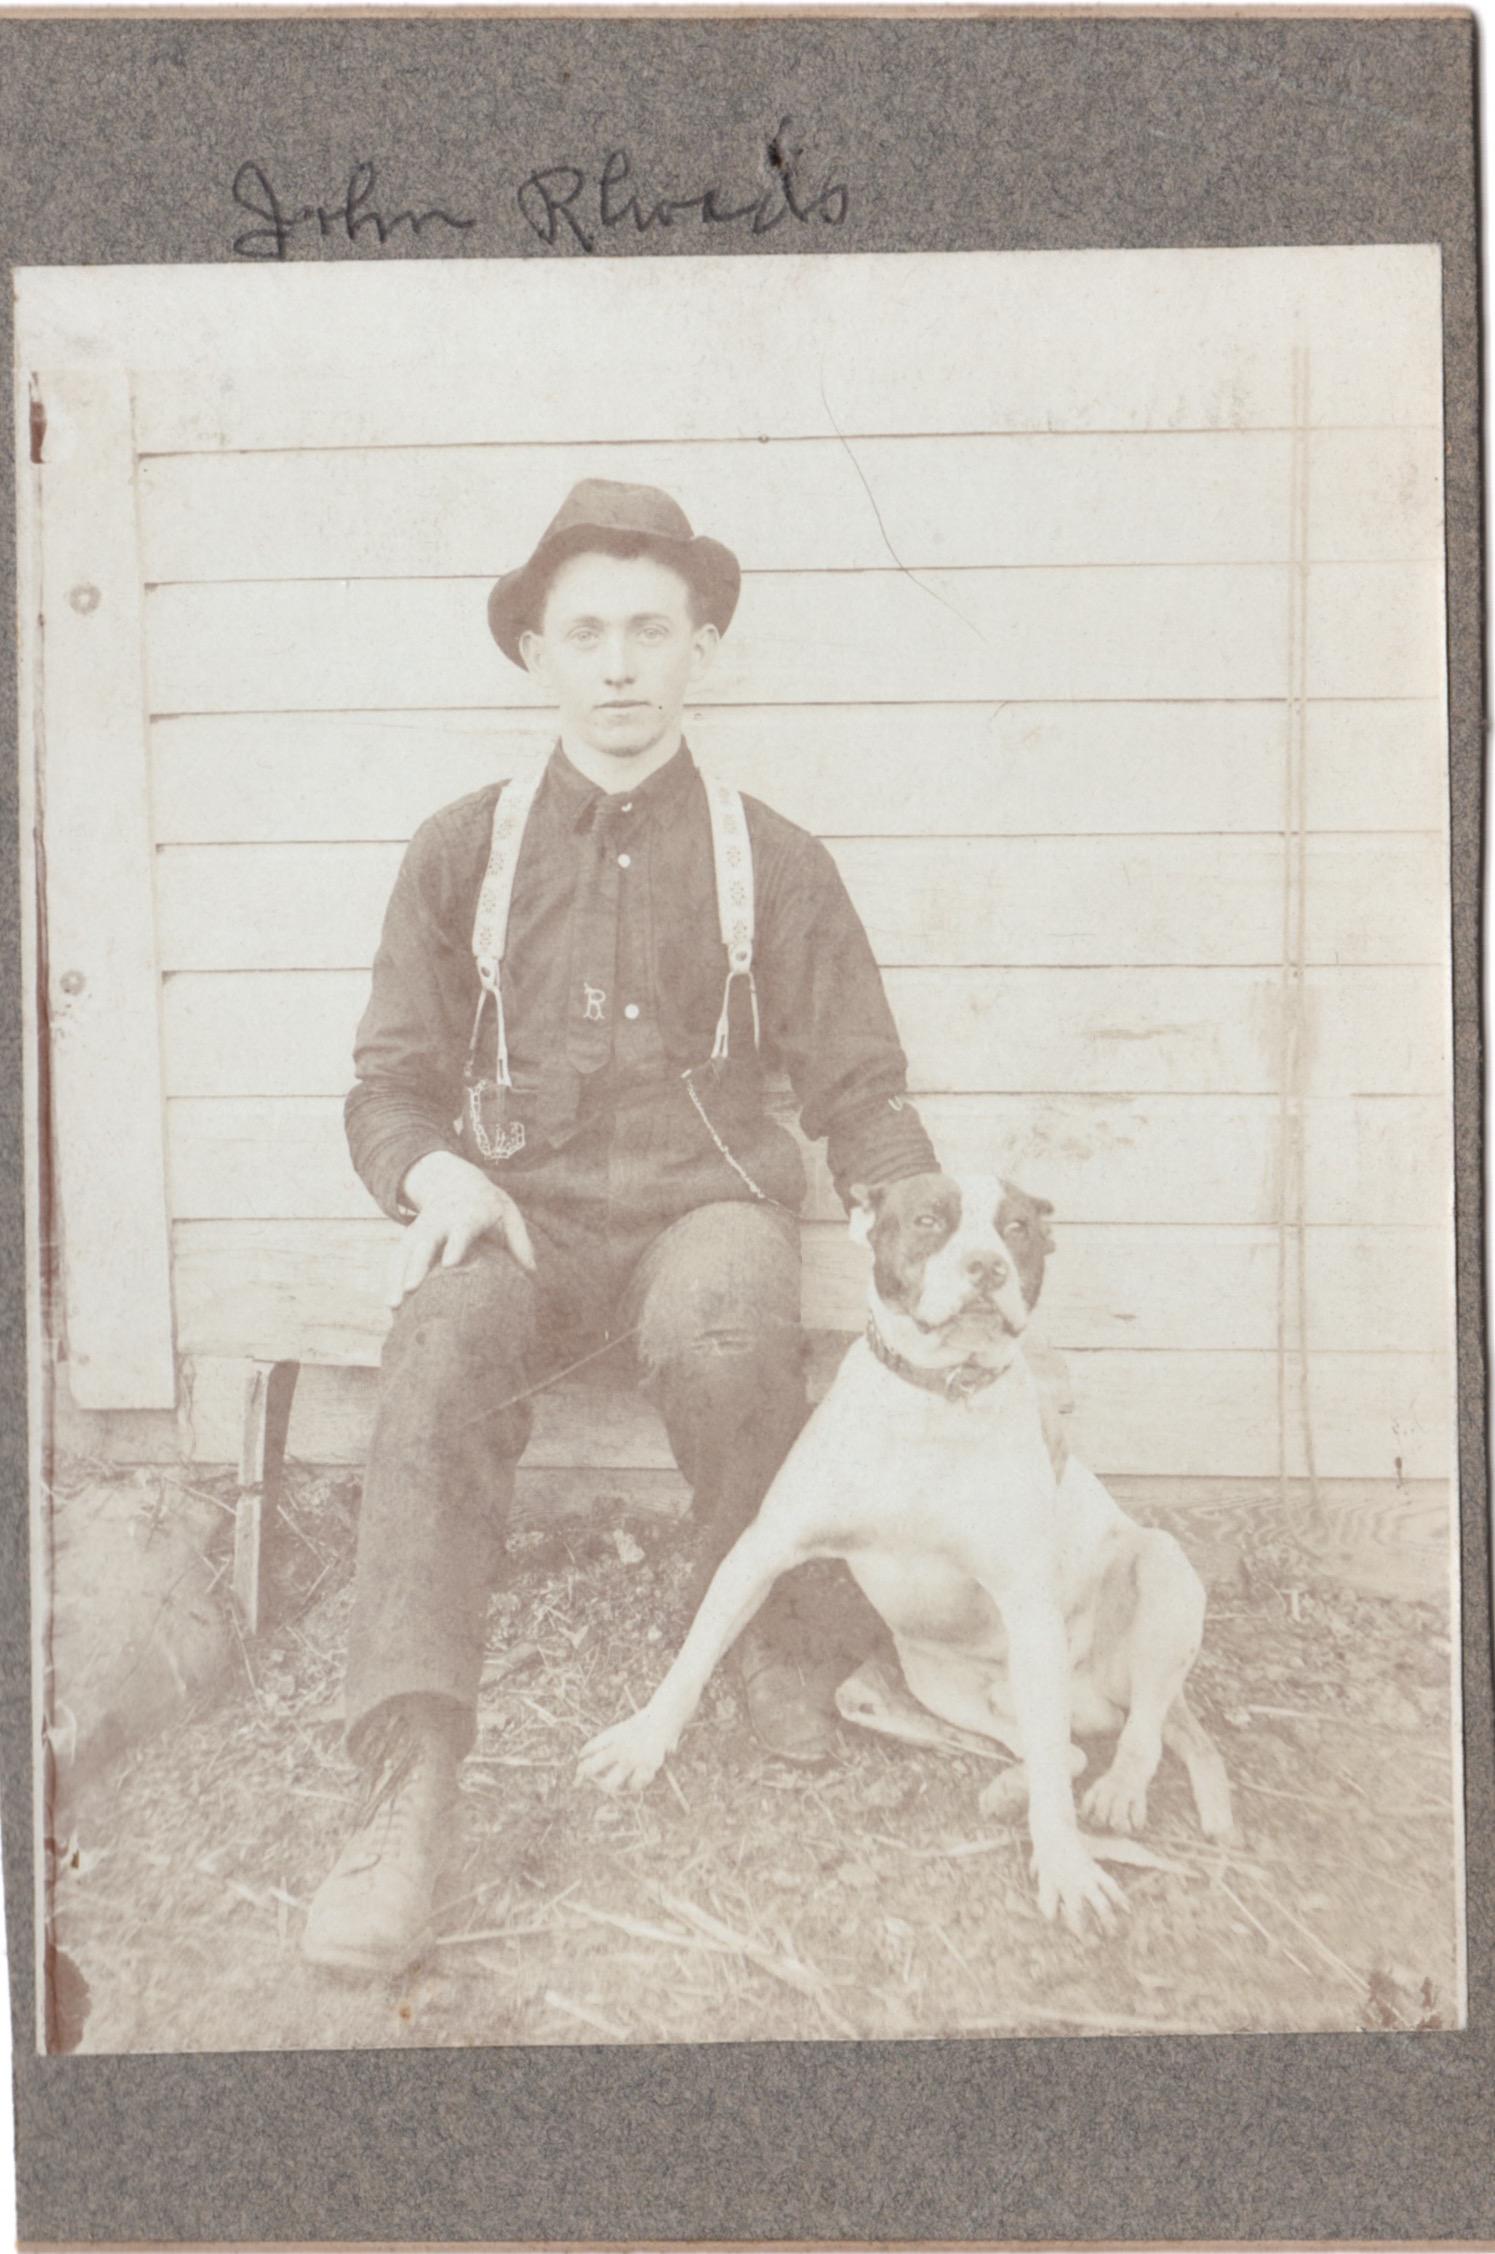 John Rhoads (1886-1922)